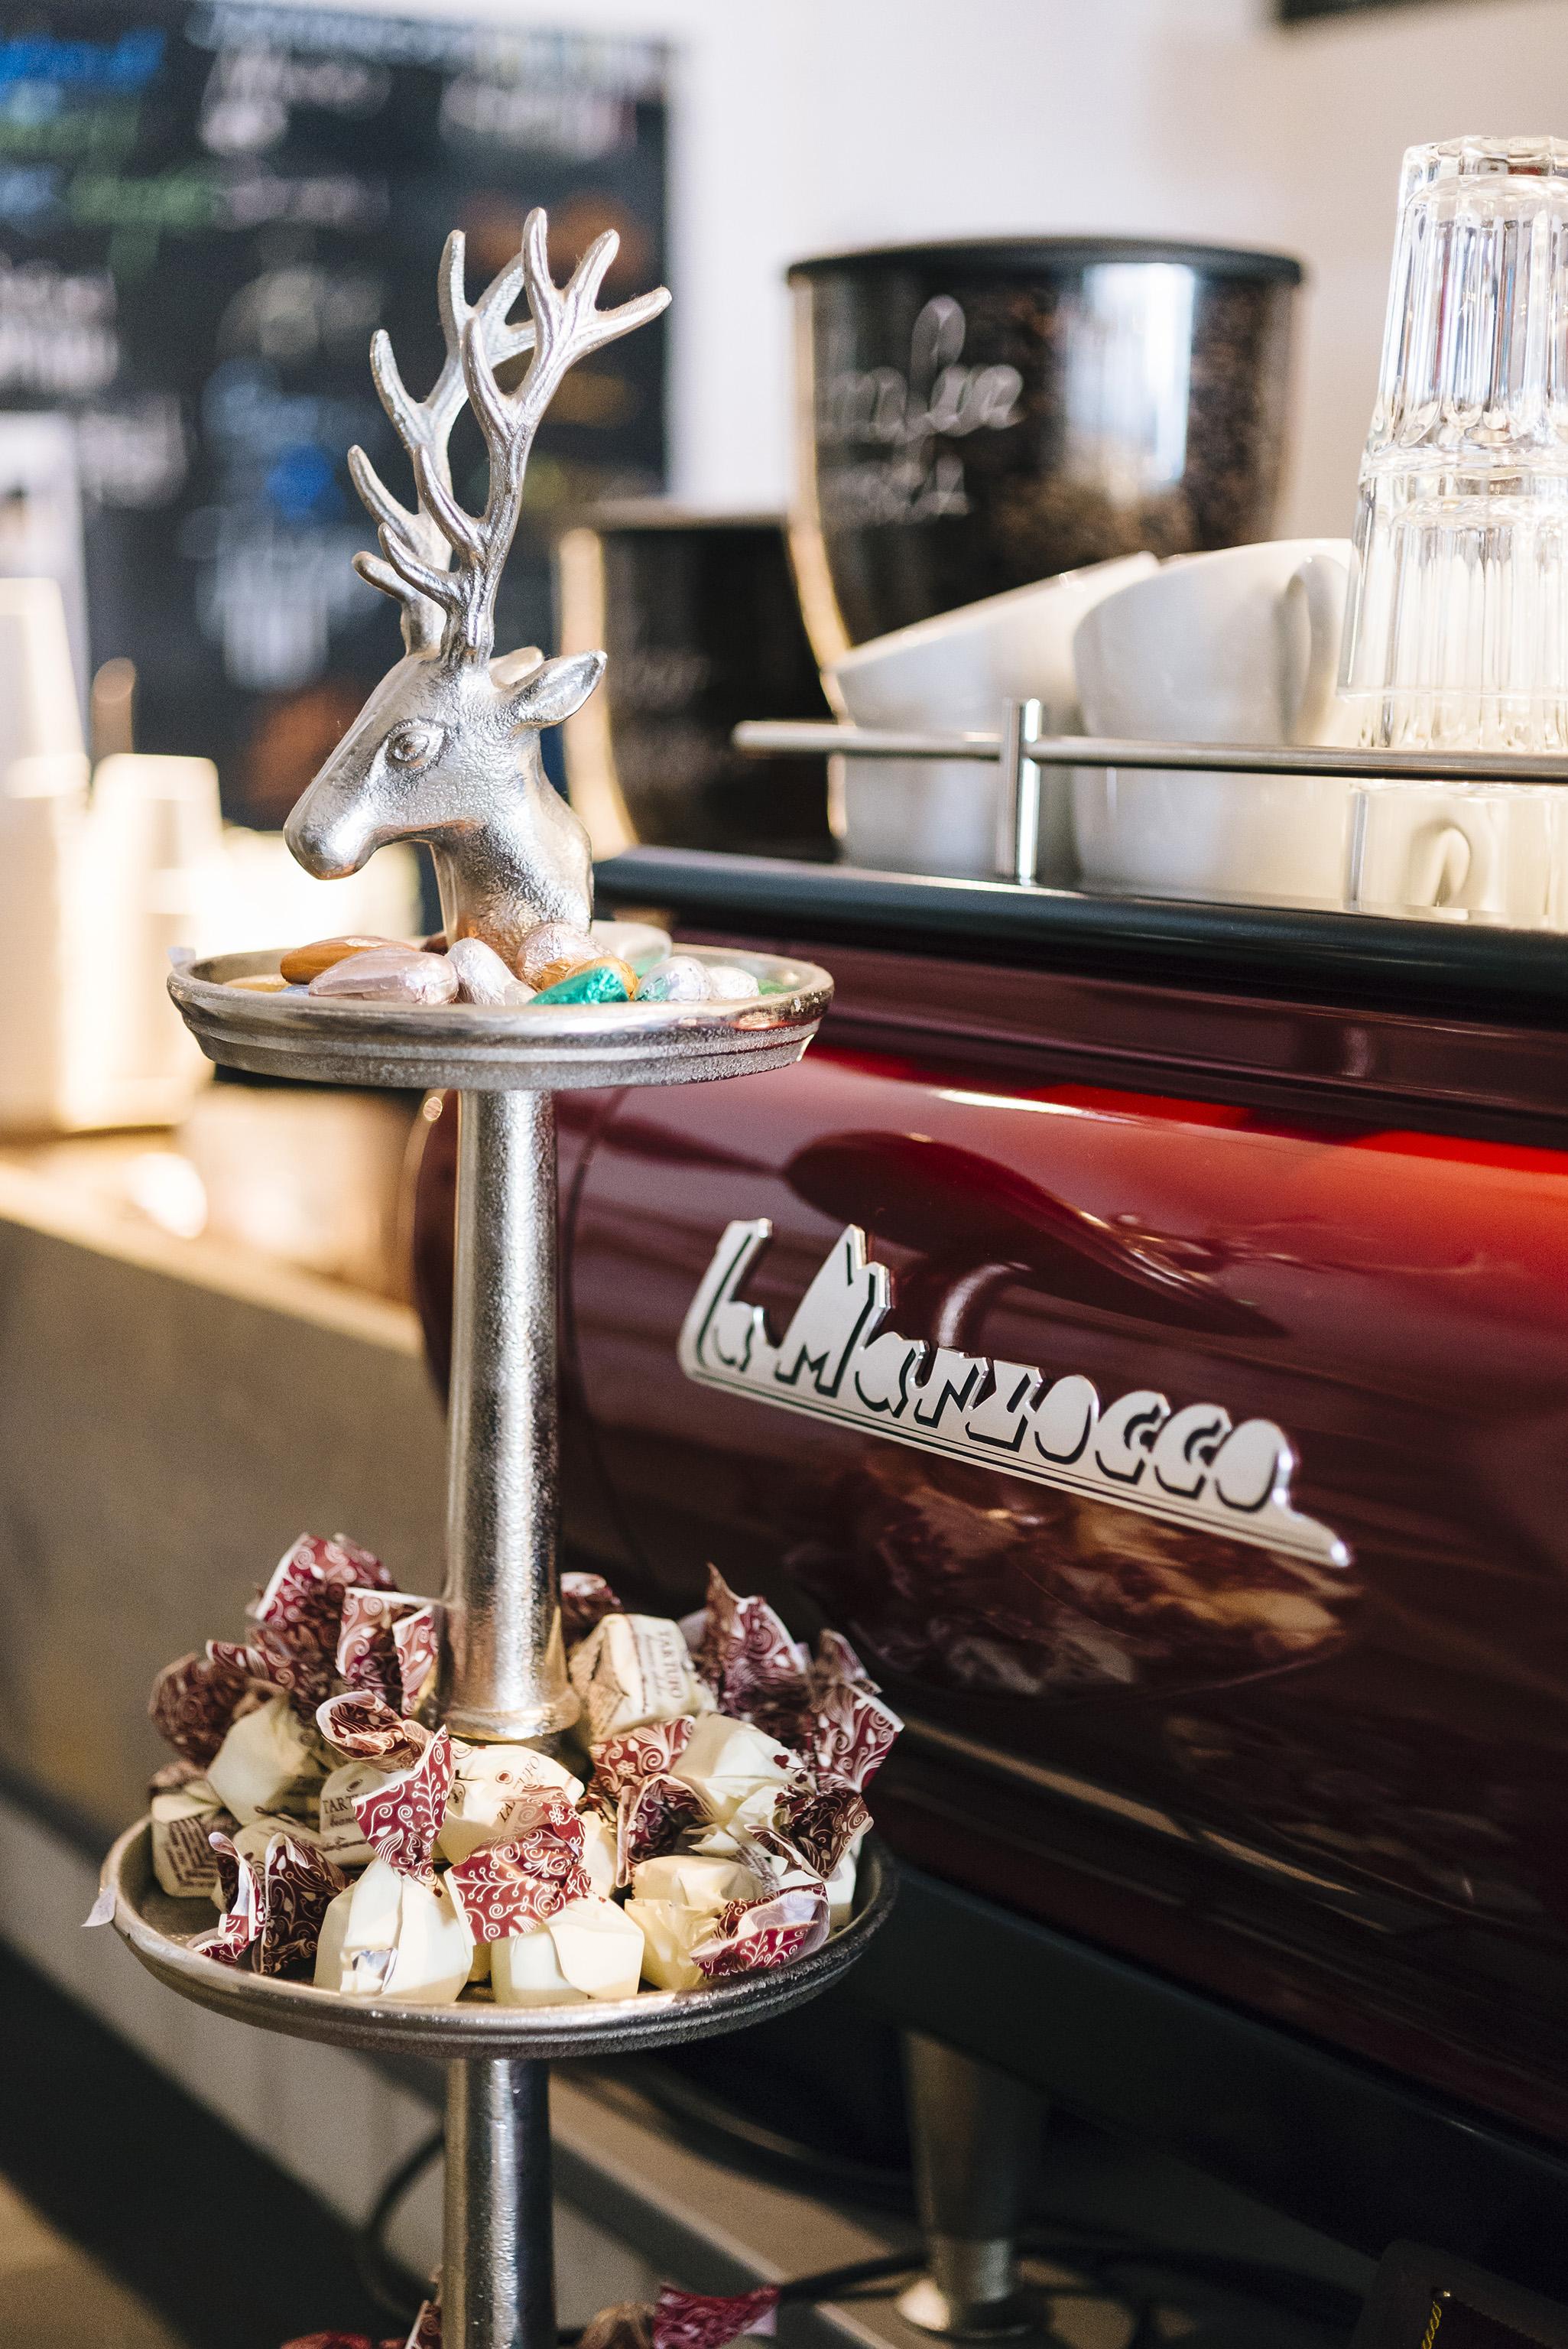 sweet-coffee-pirates-rüttenscheid-essen-pottspott-18.jpg